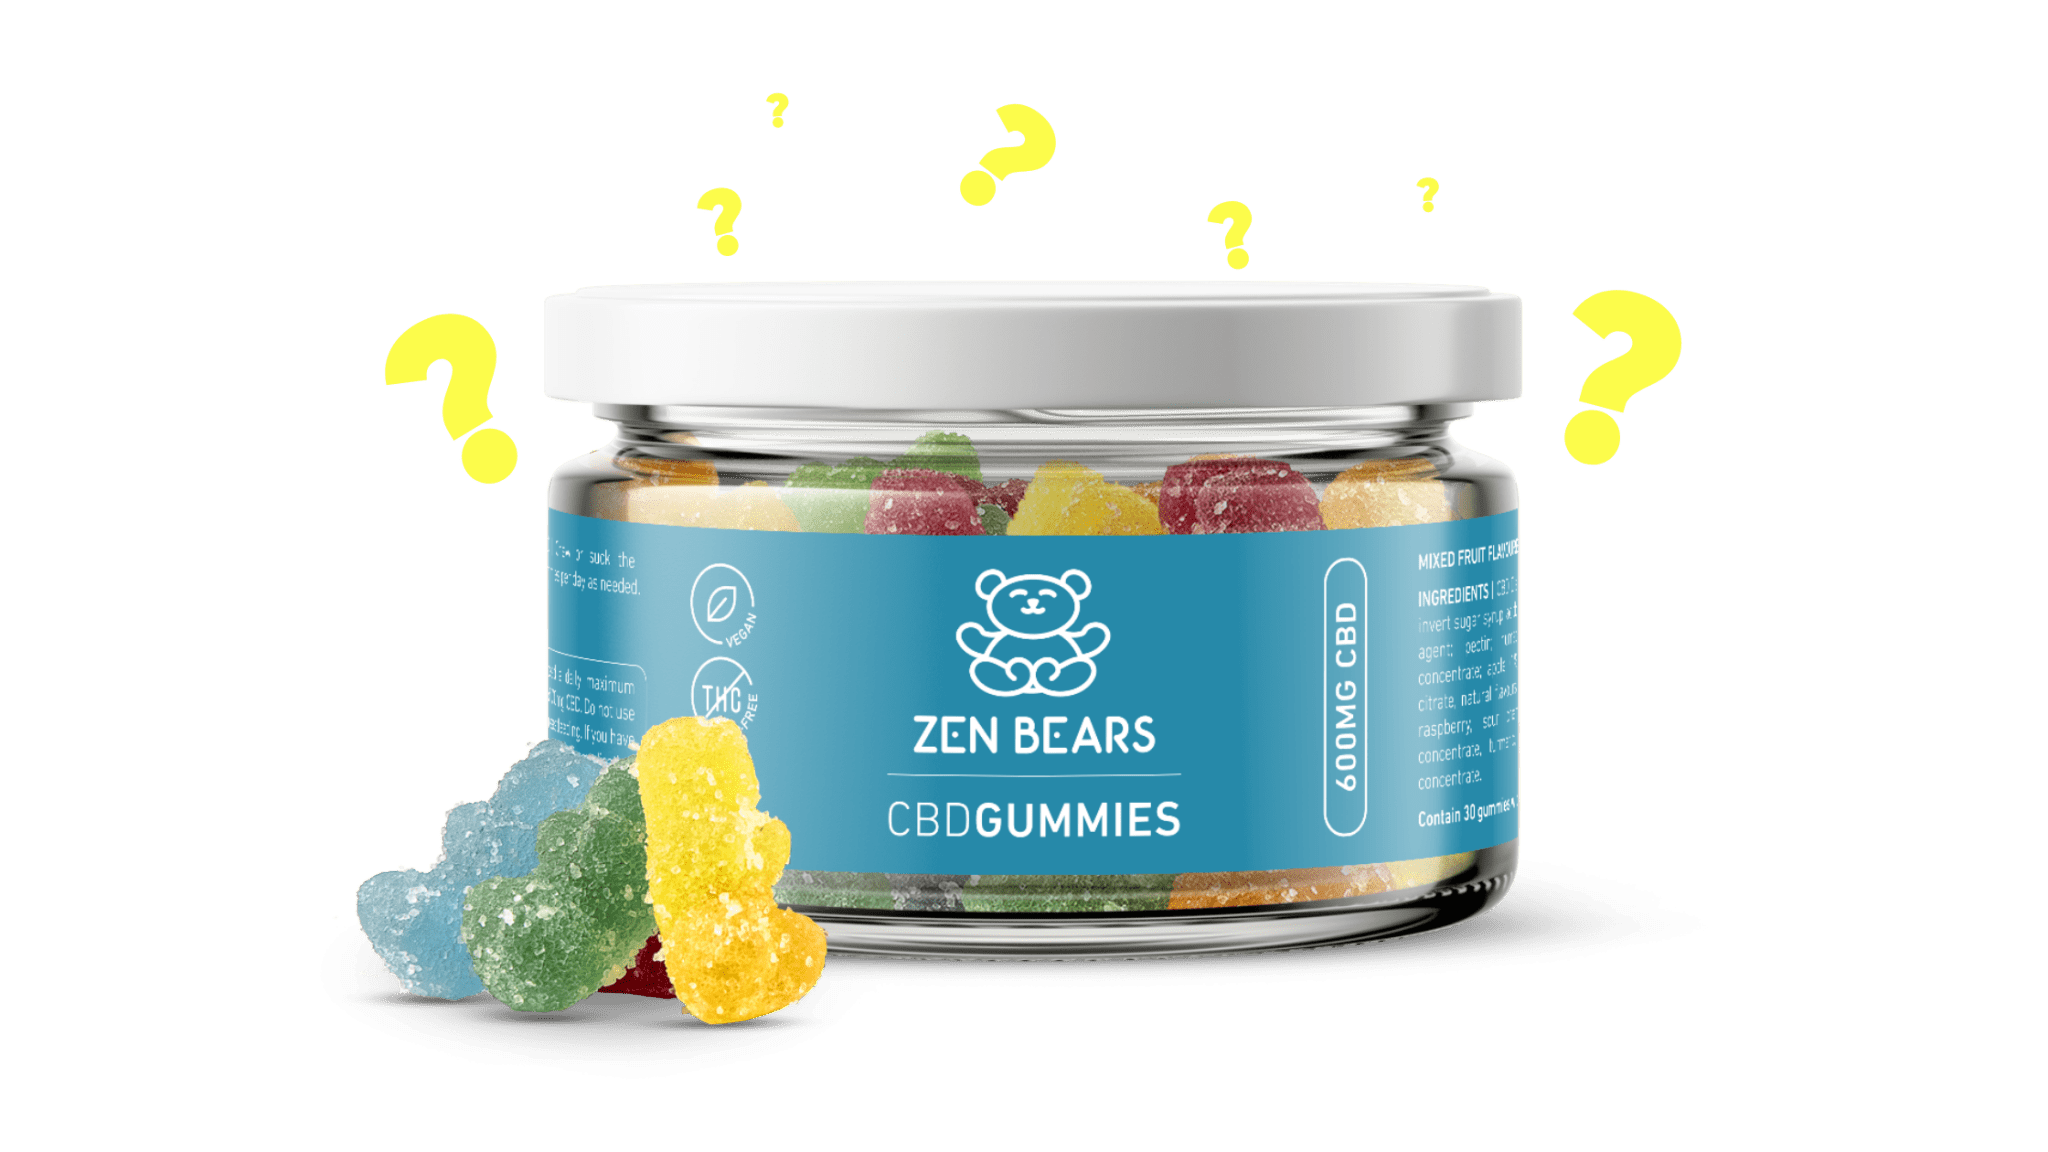 zenbears-jar-question-mark